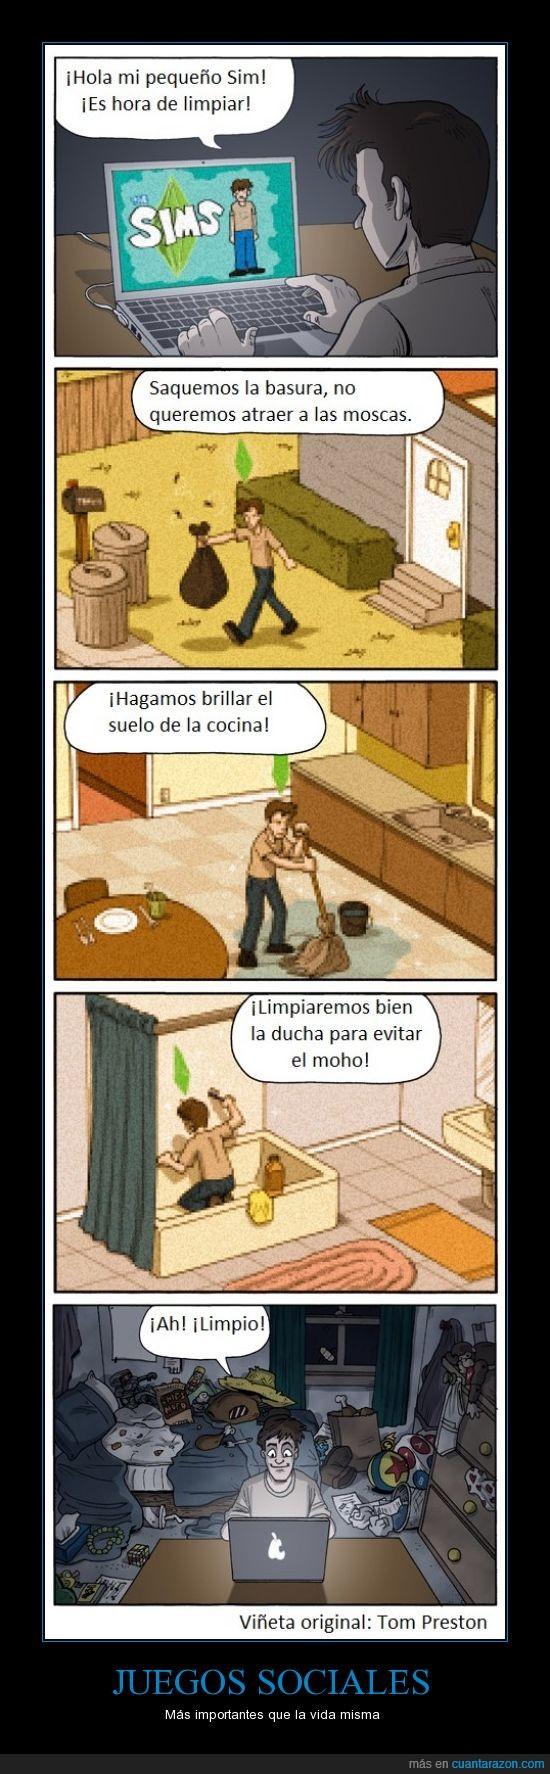 limpieza,Los Sims,sims,Viñeta